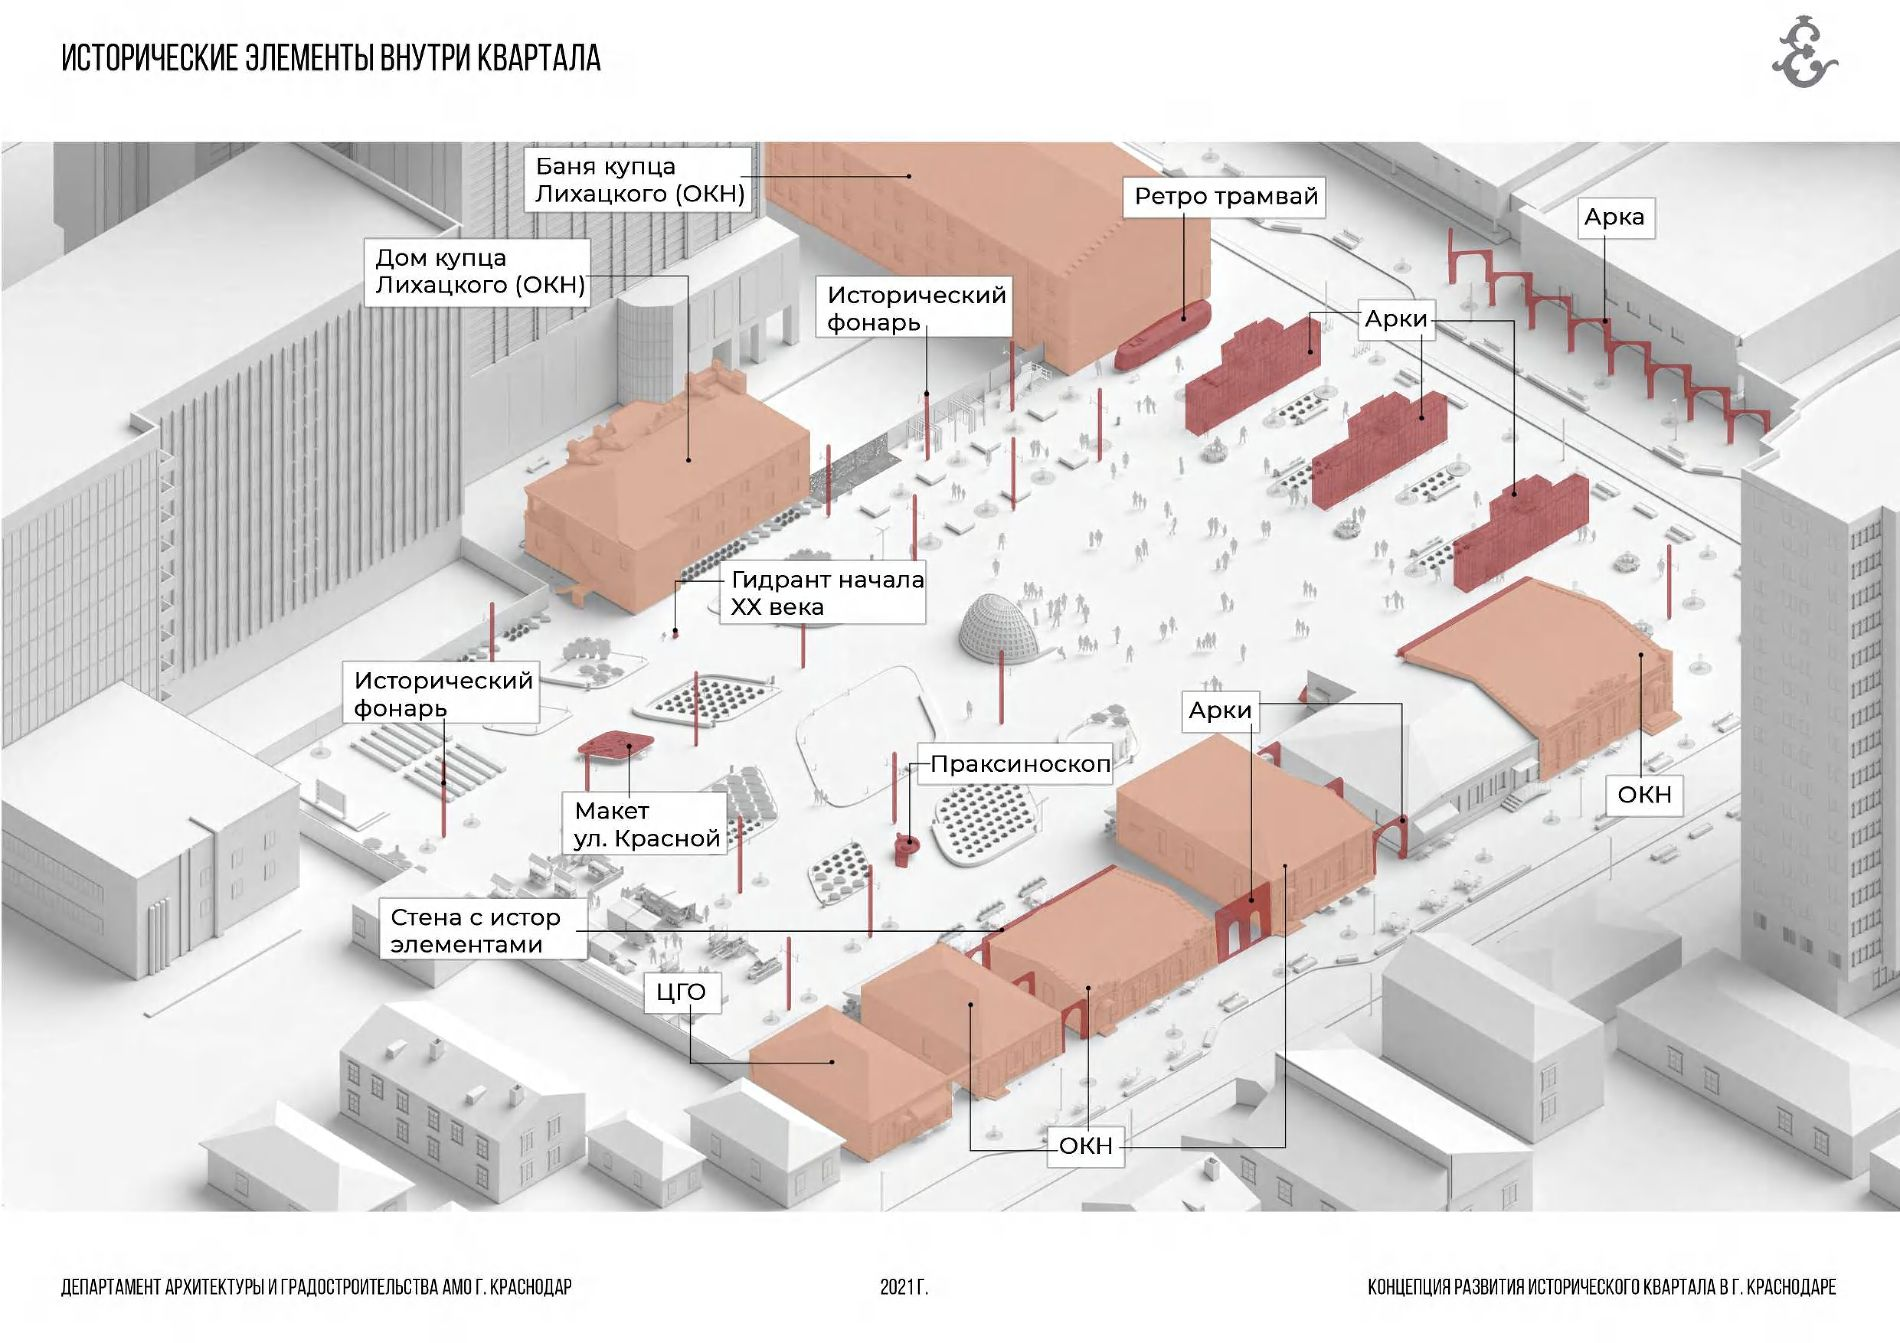 ©Презентация исторического квартала с сайта администрации Краснодара, krd.ru